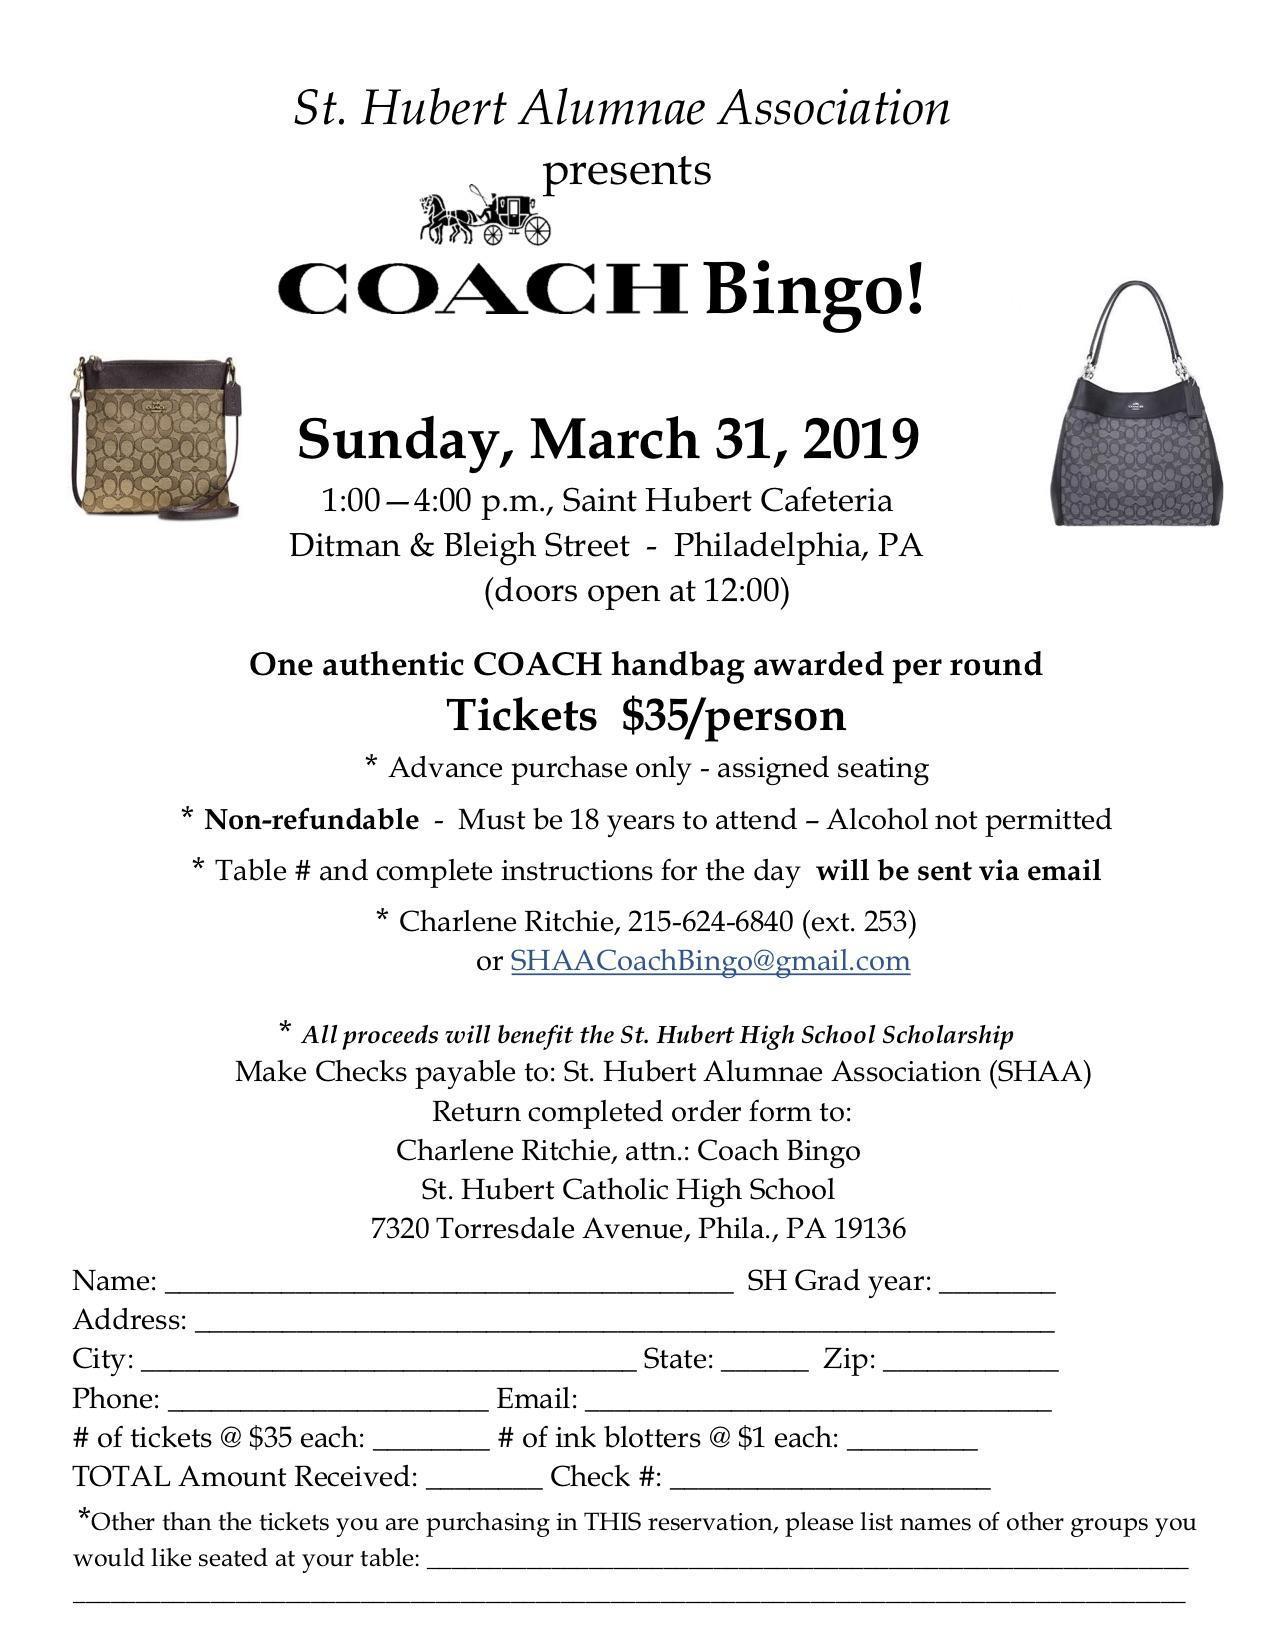 Coach Bingo order form – Upcoming Events – St Hubert Catholic High ... 078bfc11b4